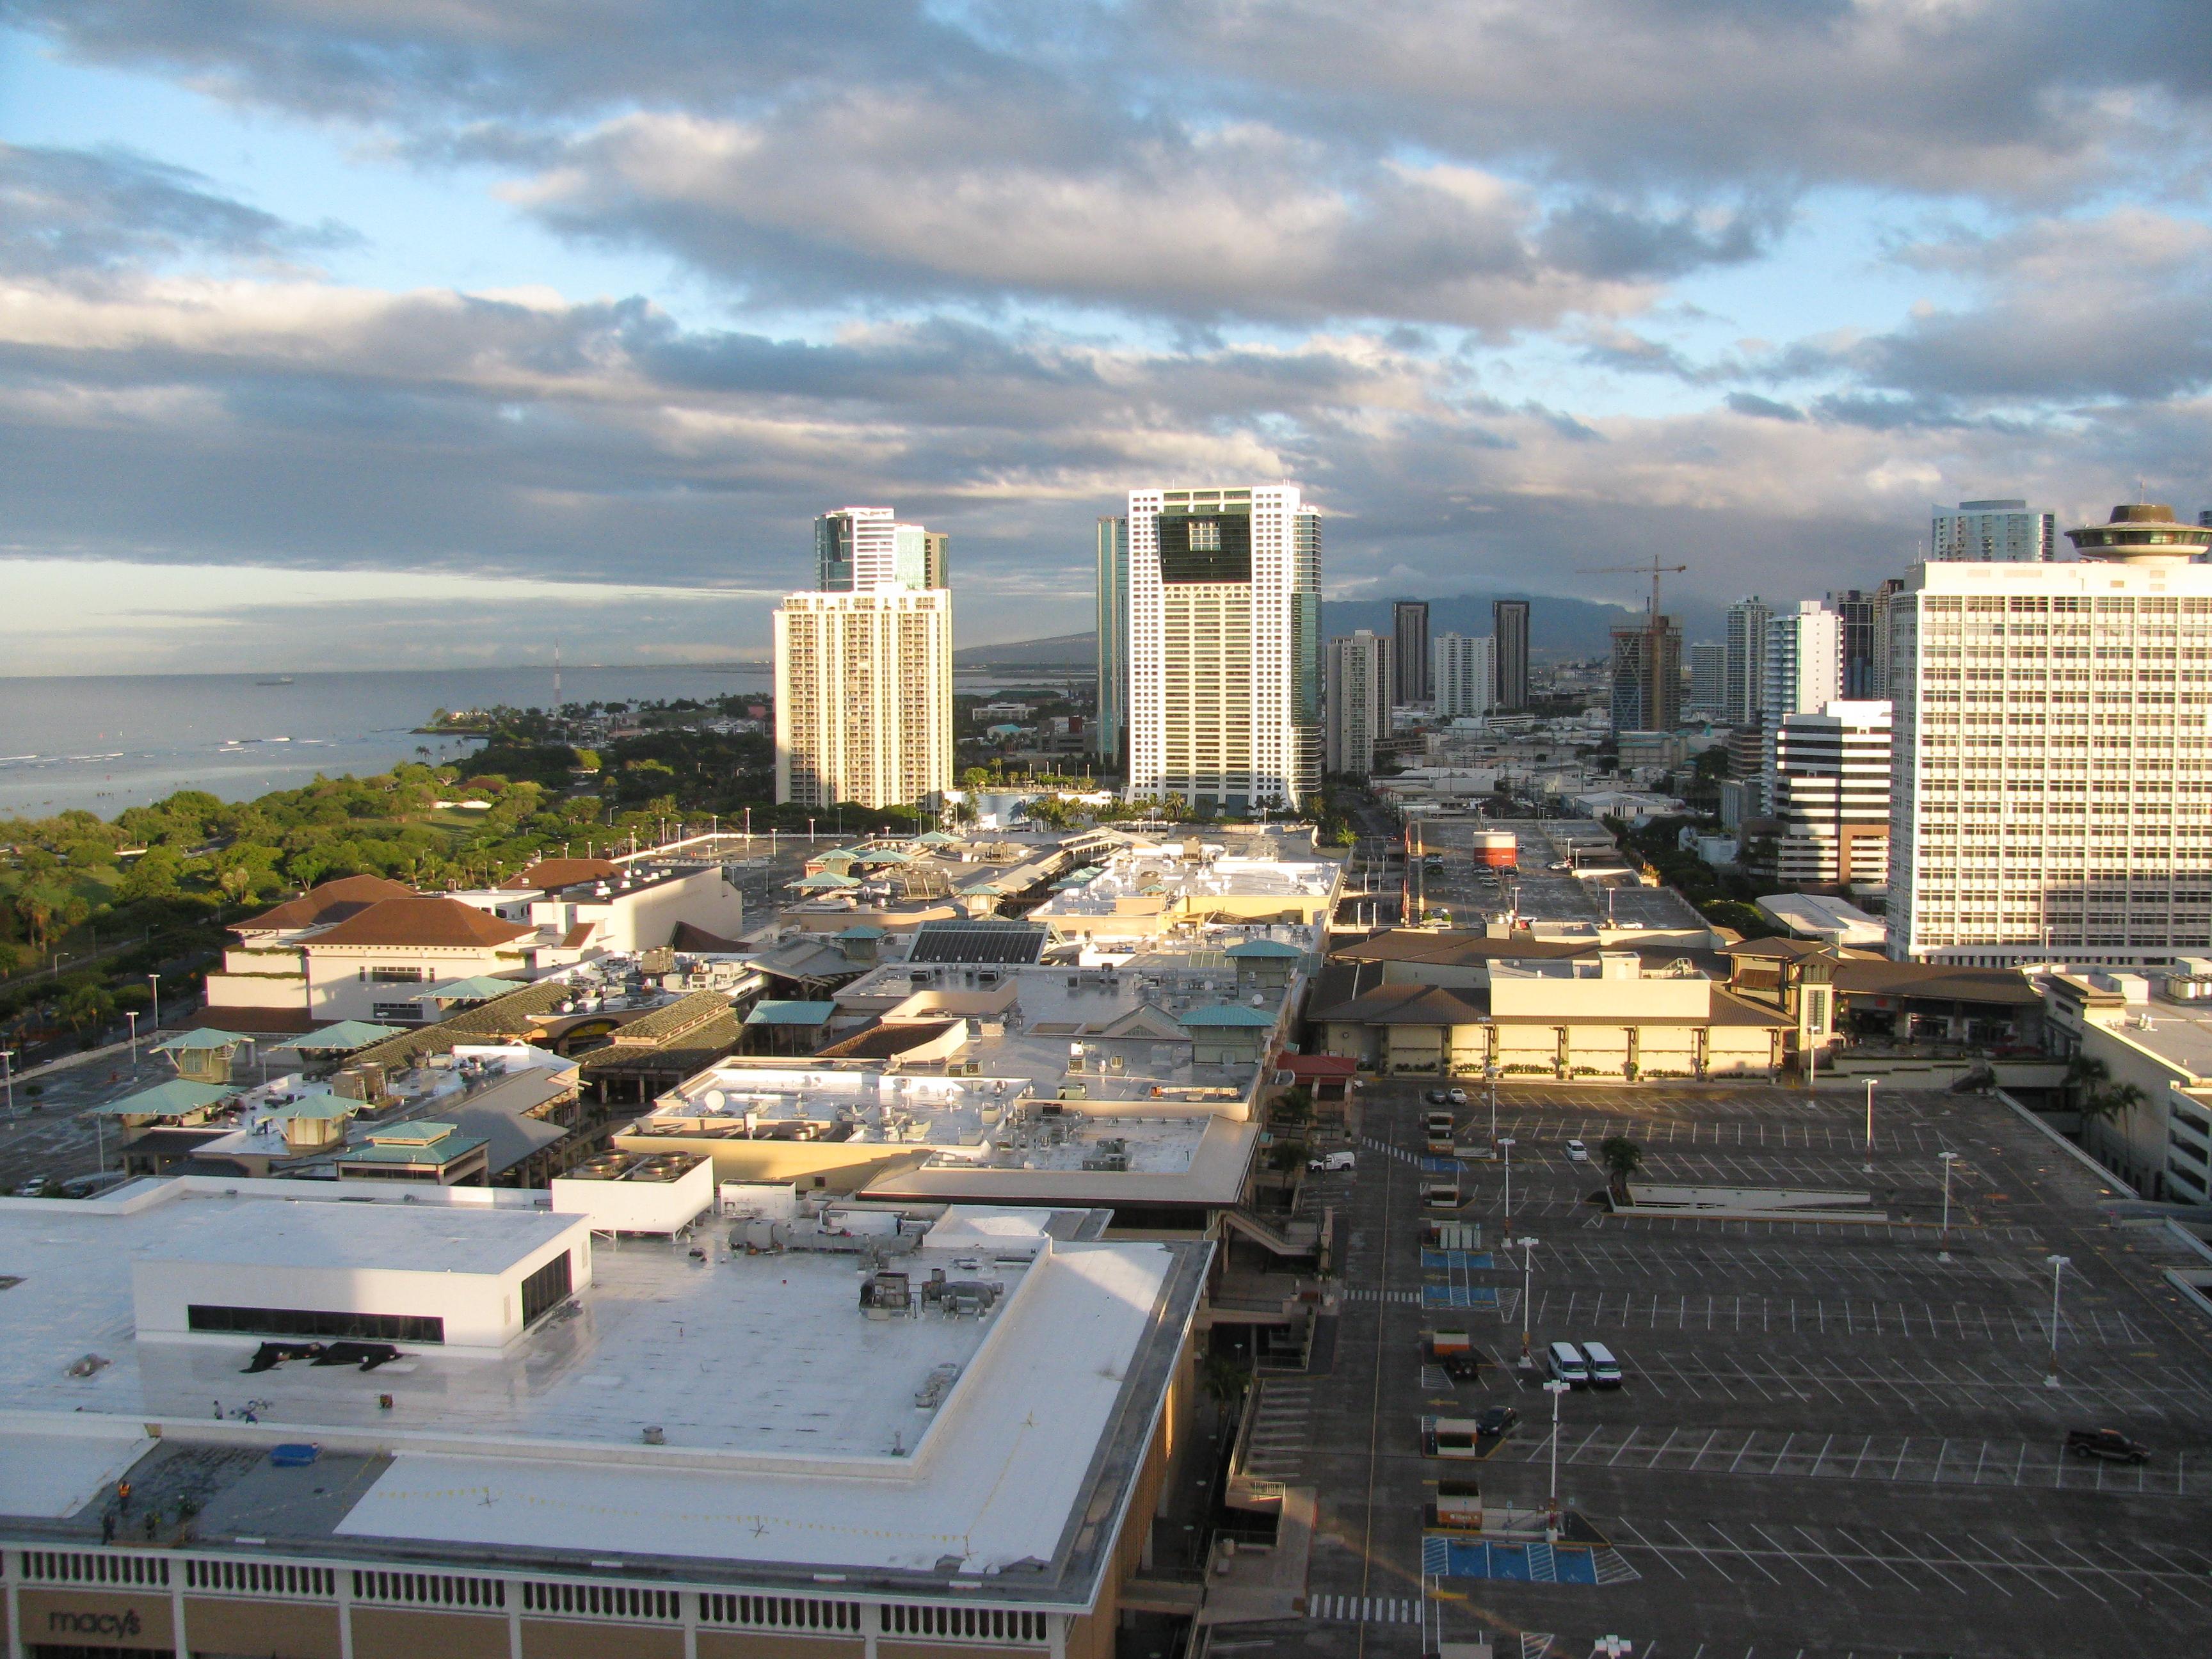 File Starr 100806 3607 Schefflera Actinophylla Habitat View Ala Moana Mall Roof Ala Moana Hotel Honolulu Oahu 24750900440 Jpg Wikimedia Commons